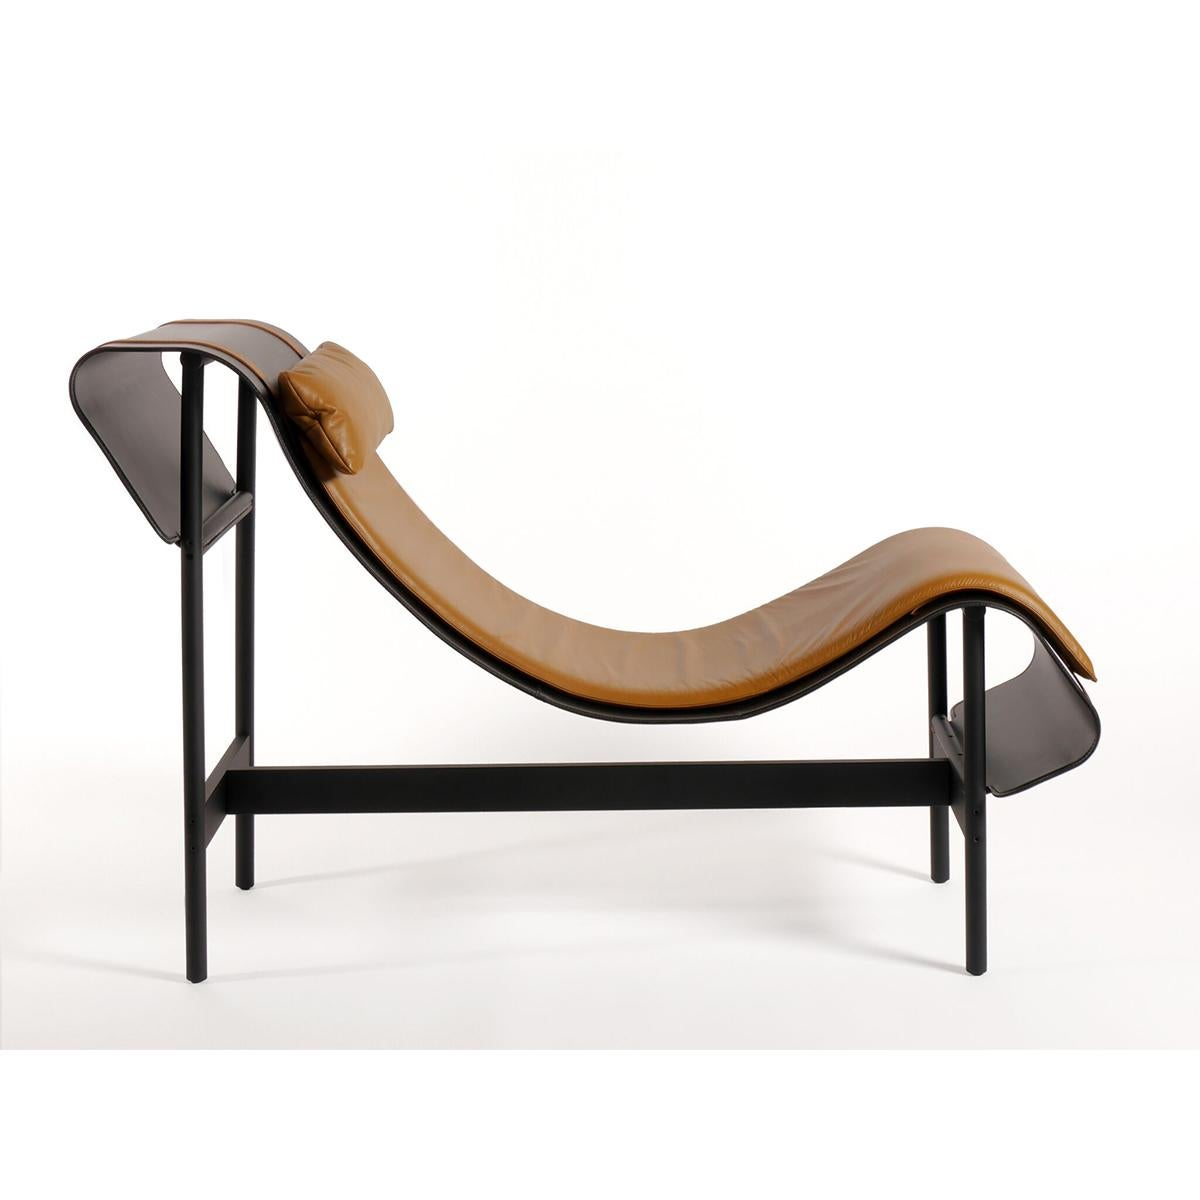 Cushion Leather Platform And Curved Chaise Longue K1JTFlc